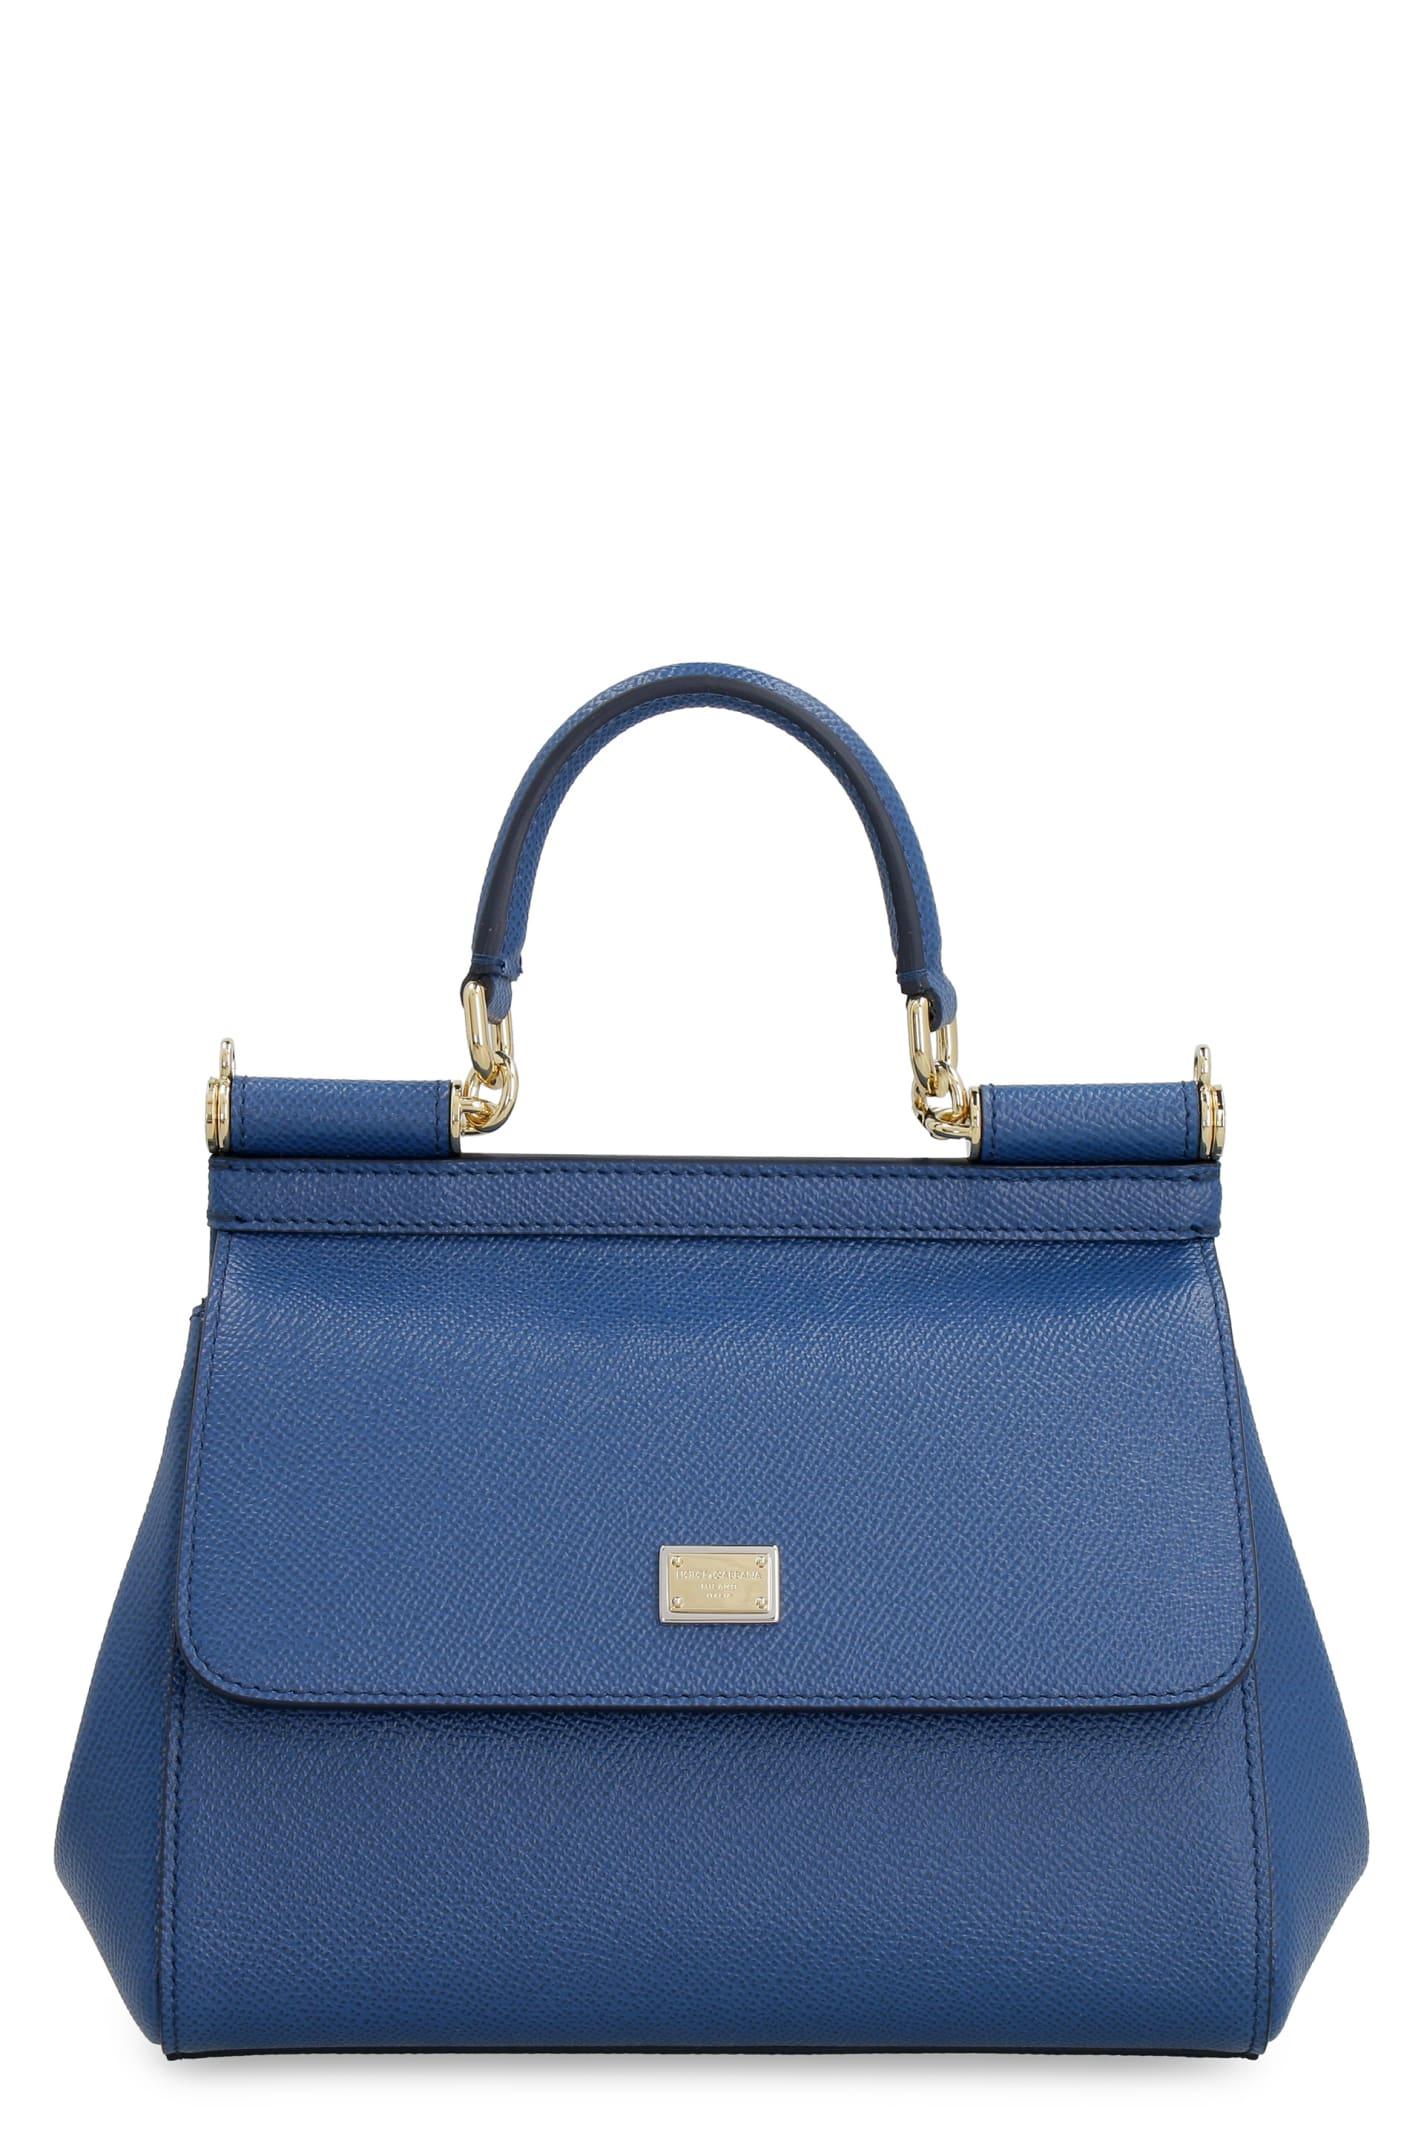 Dolce & Gabbana SICILY LEATHER MINI-BAG